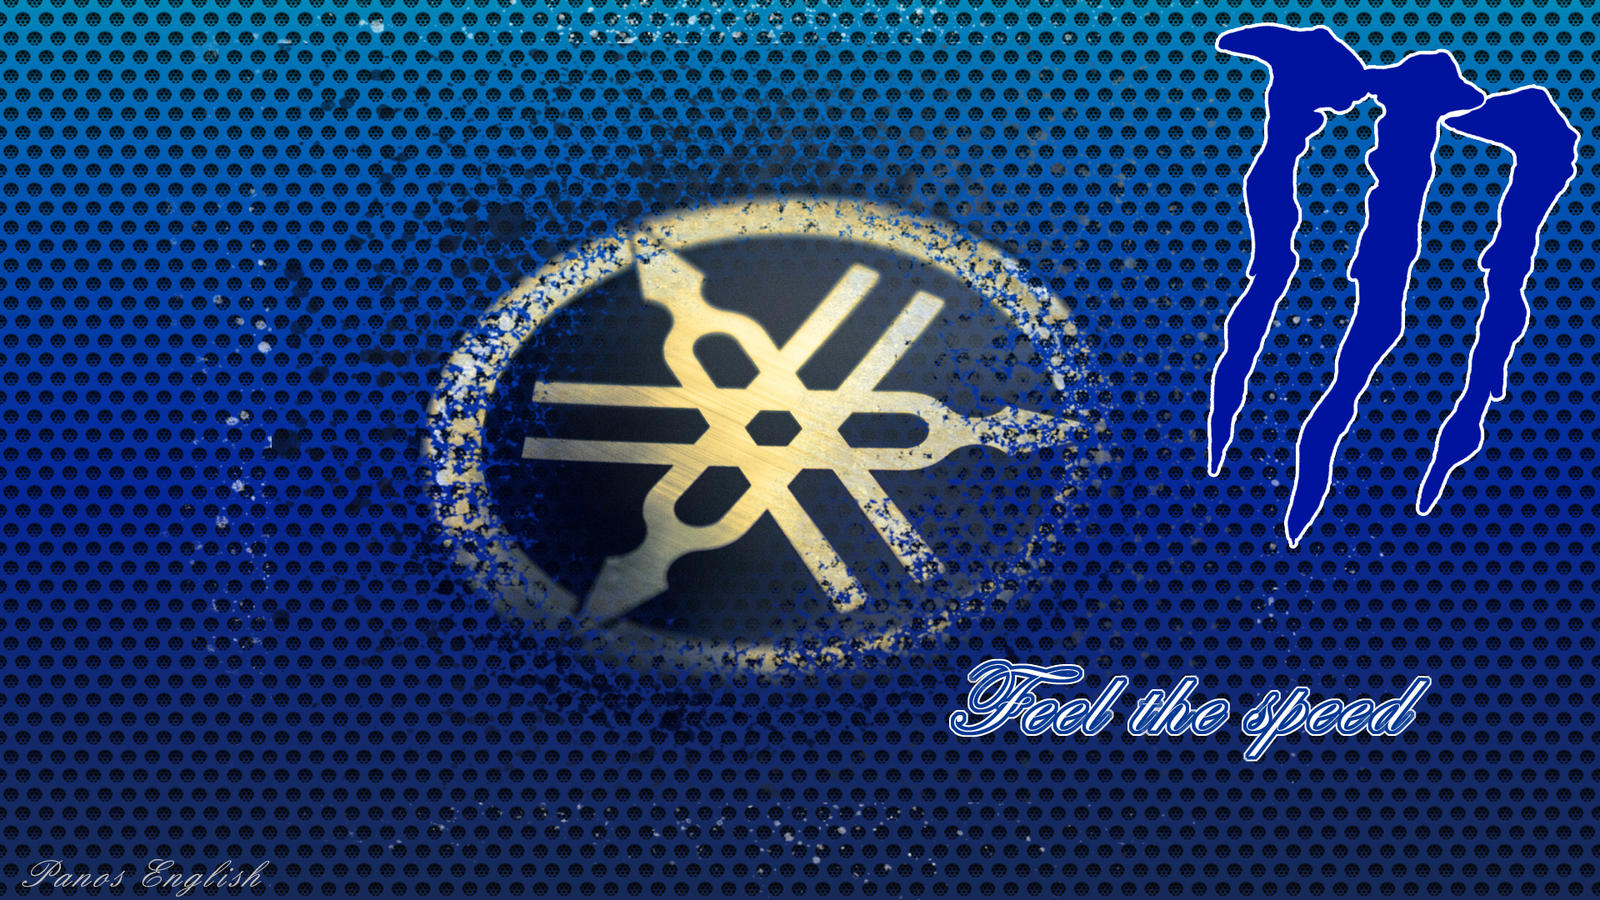 Yamaha Logo Hd Wallpaper The